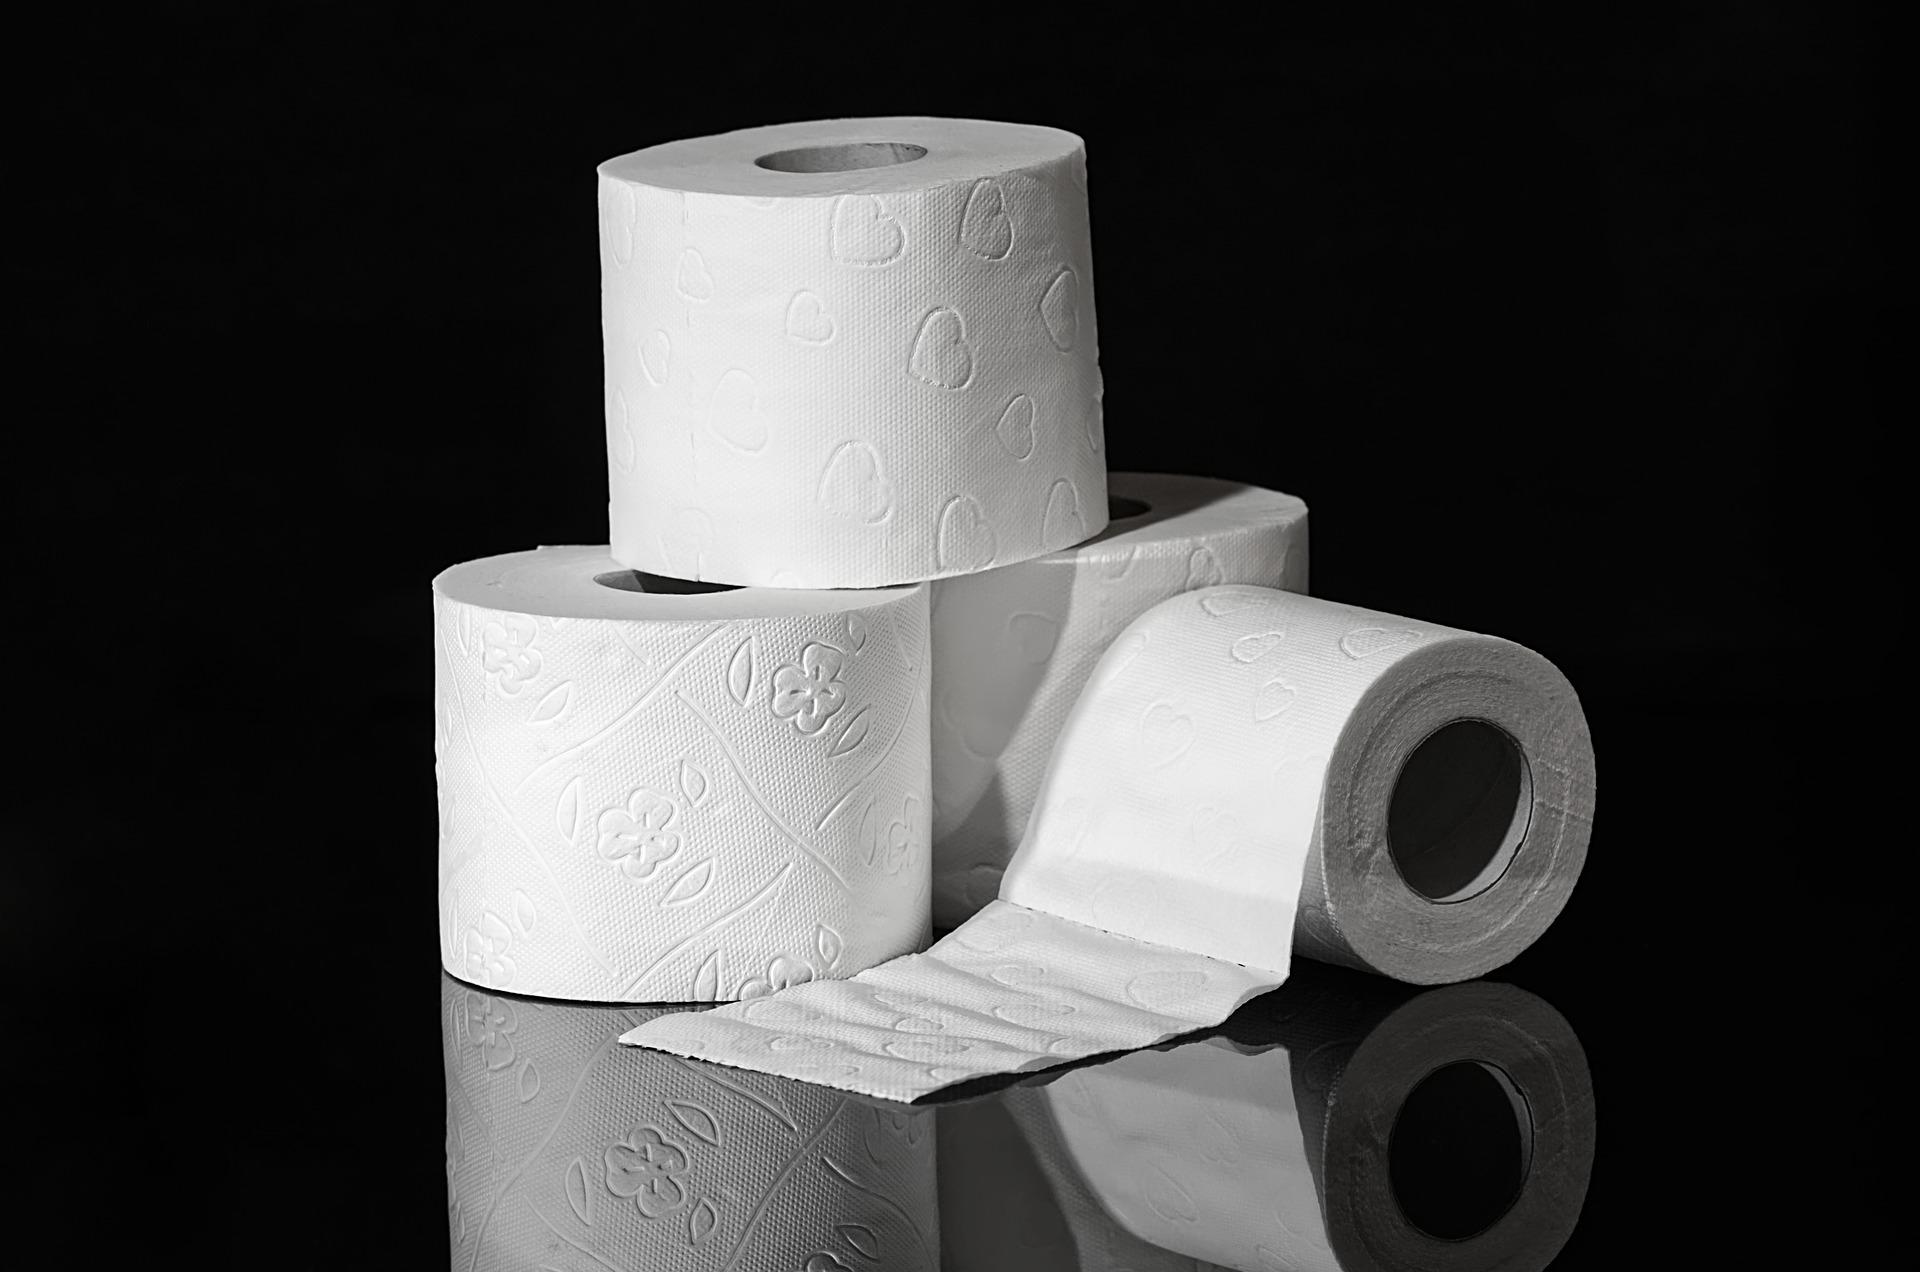 Causes of Diarrhoea